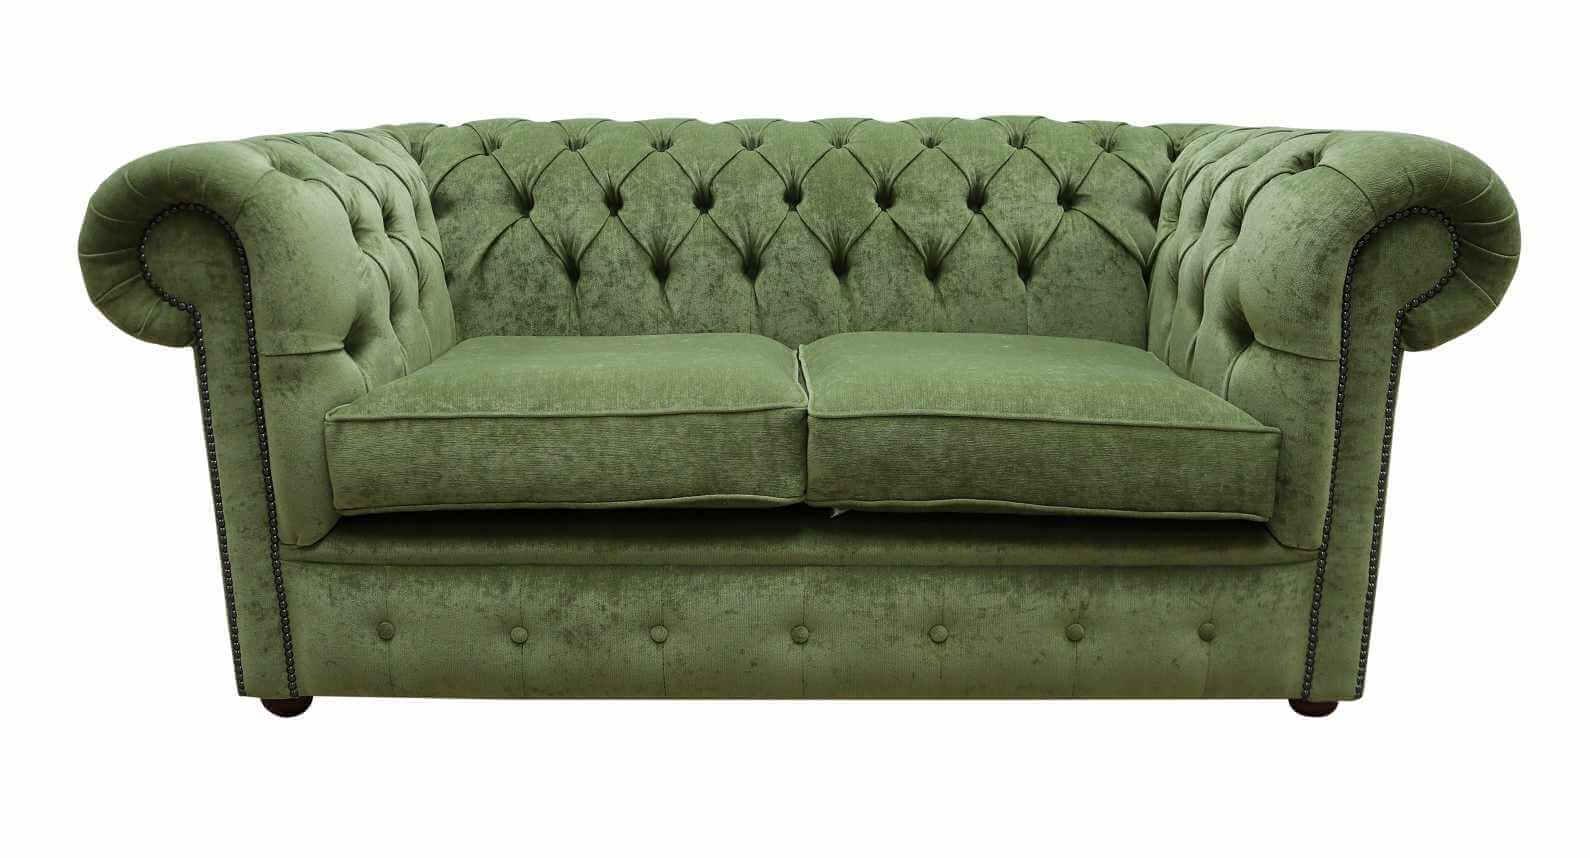 - Buy Sage Green Fabric Chesterfield Sofa DesignerSofas4U